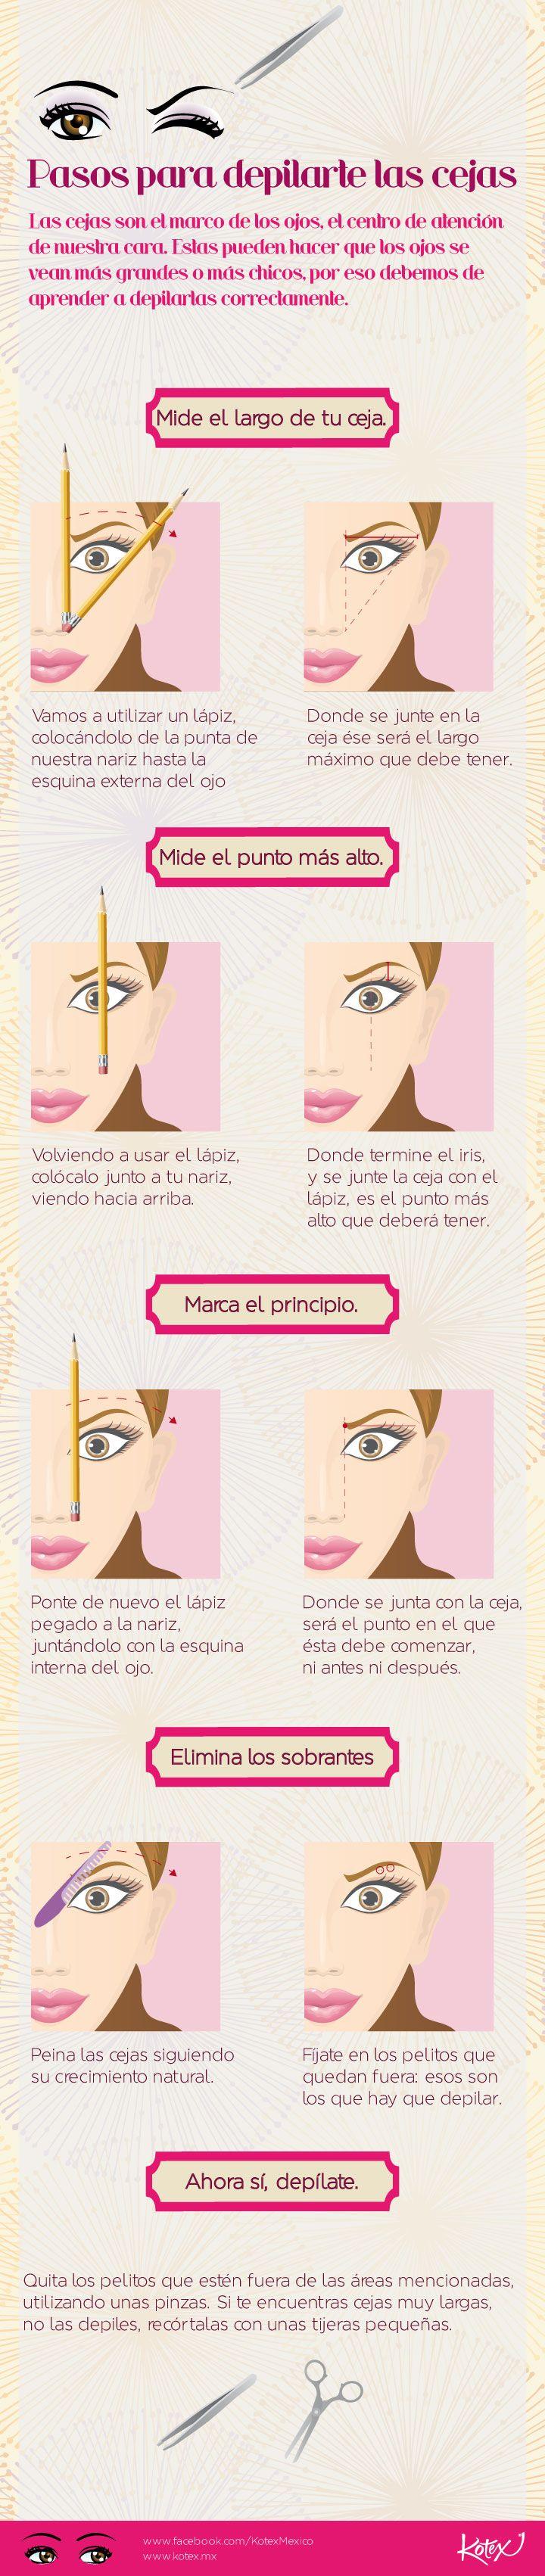 Depilación de cejas: pasos súper sencillos.     #belleza #cejas #cool #makeup #maquillaje #tutorial #infografia